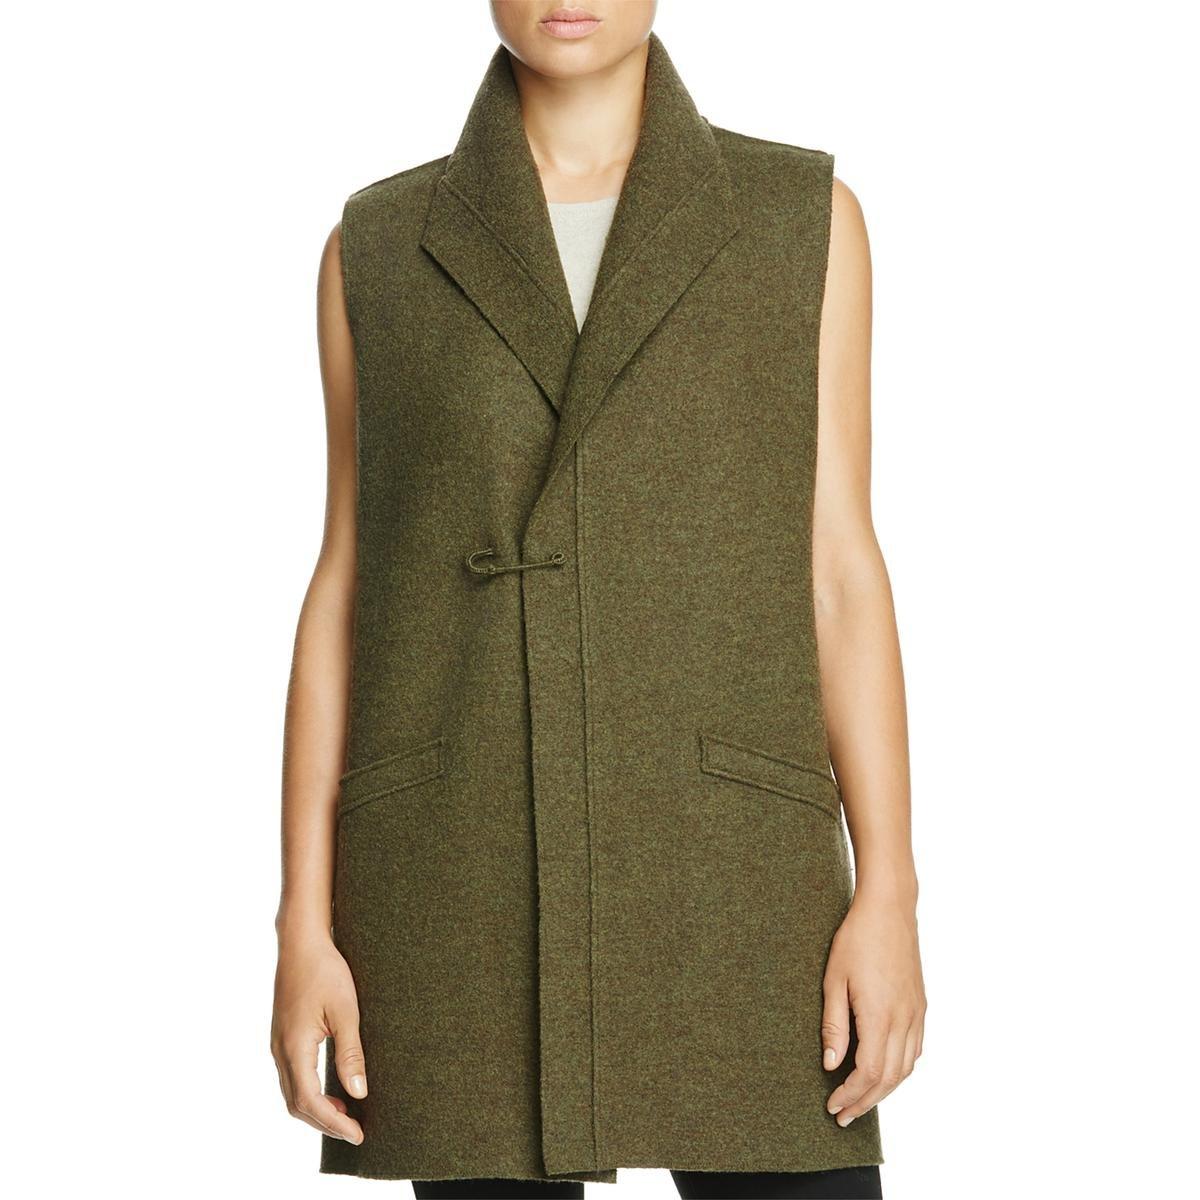 Eileen Fisher Womens Funnel Neck Sleeveless Sweater Vest Green L